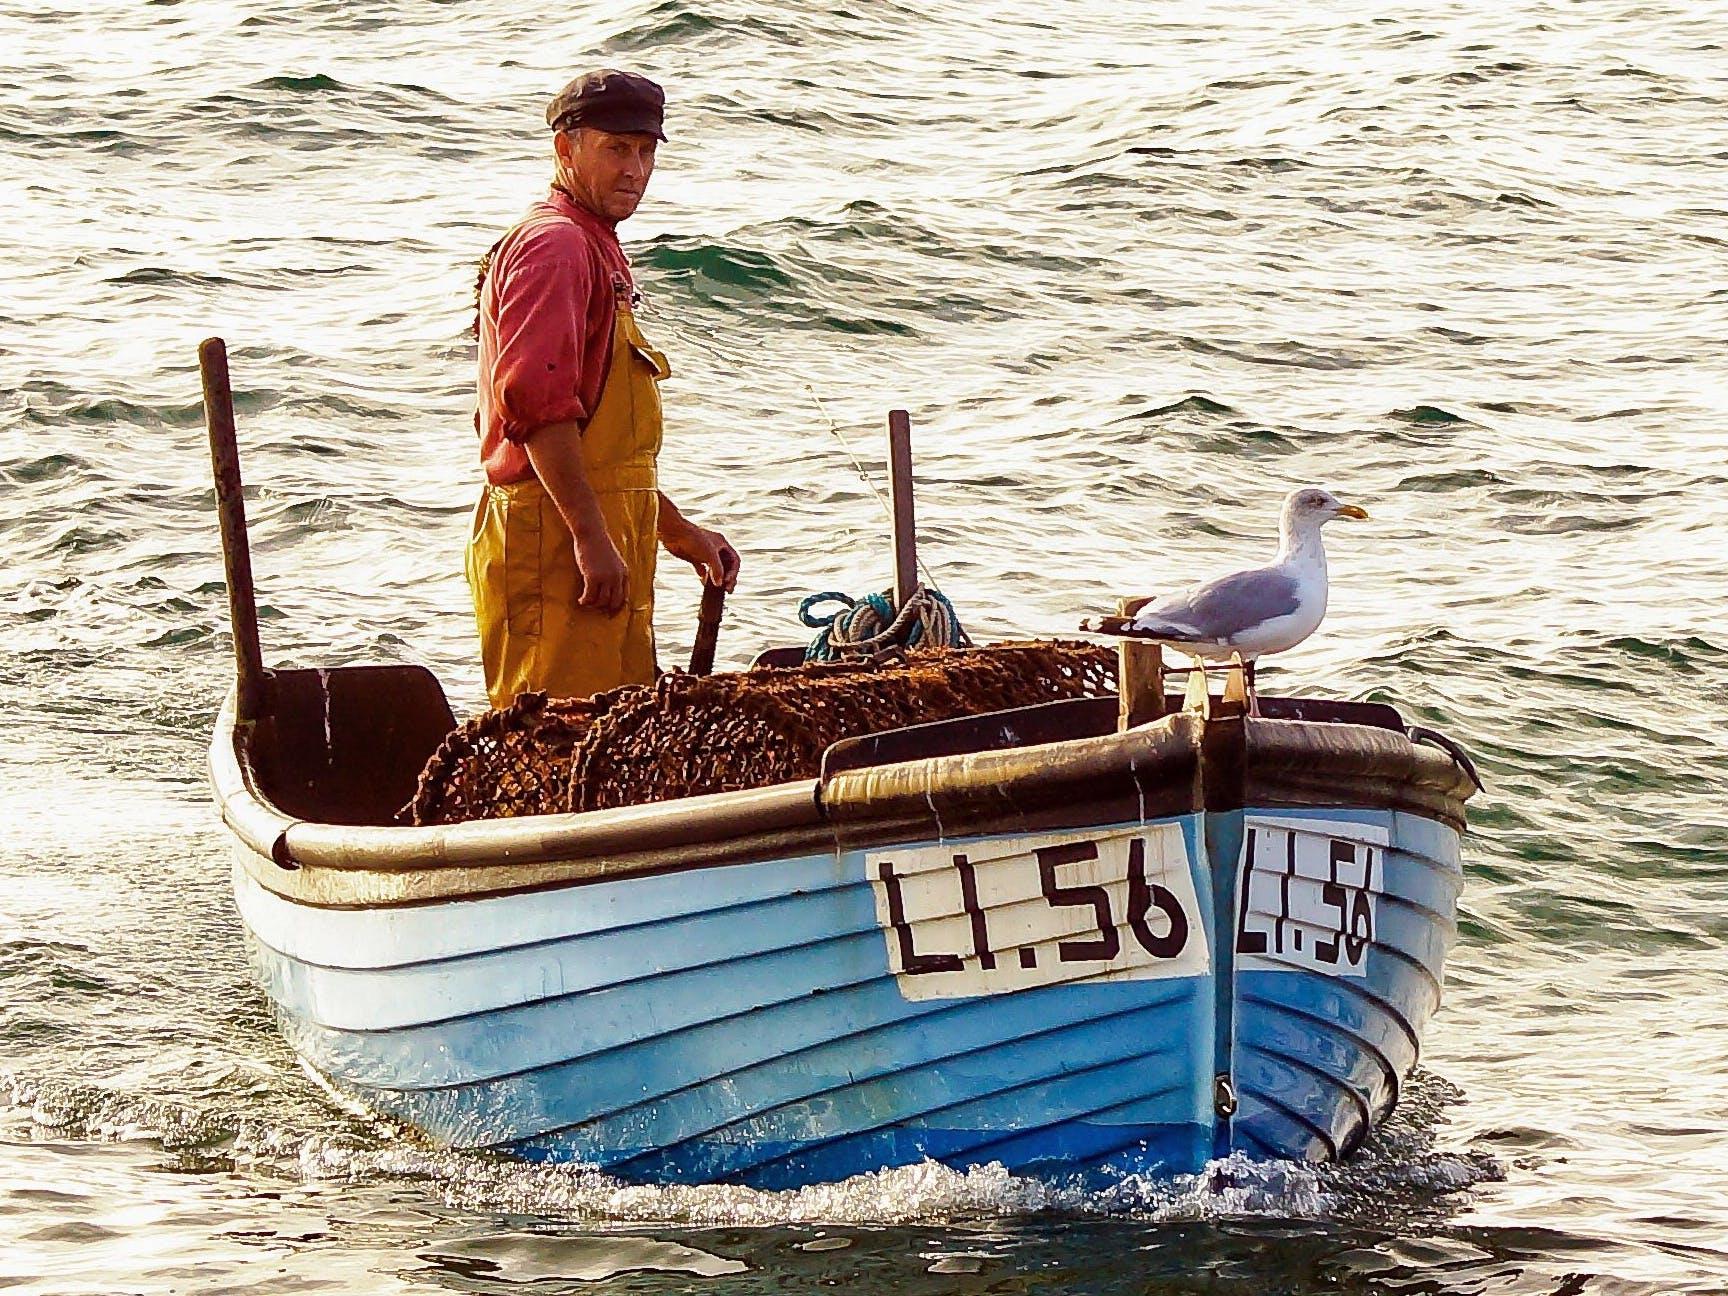 Gem Lawrence Bringing Home the Catch, Courtesy of Coastal JJ